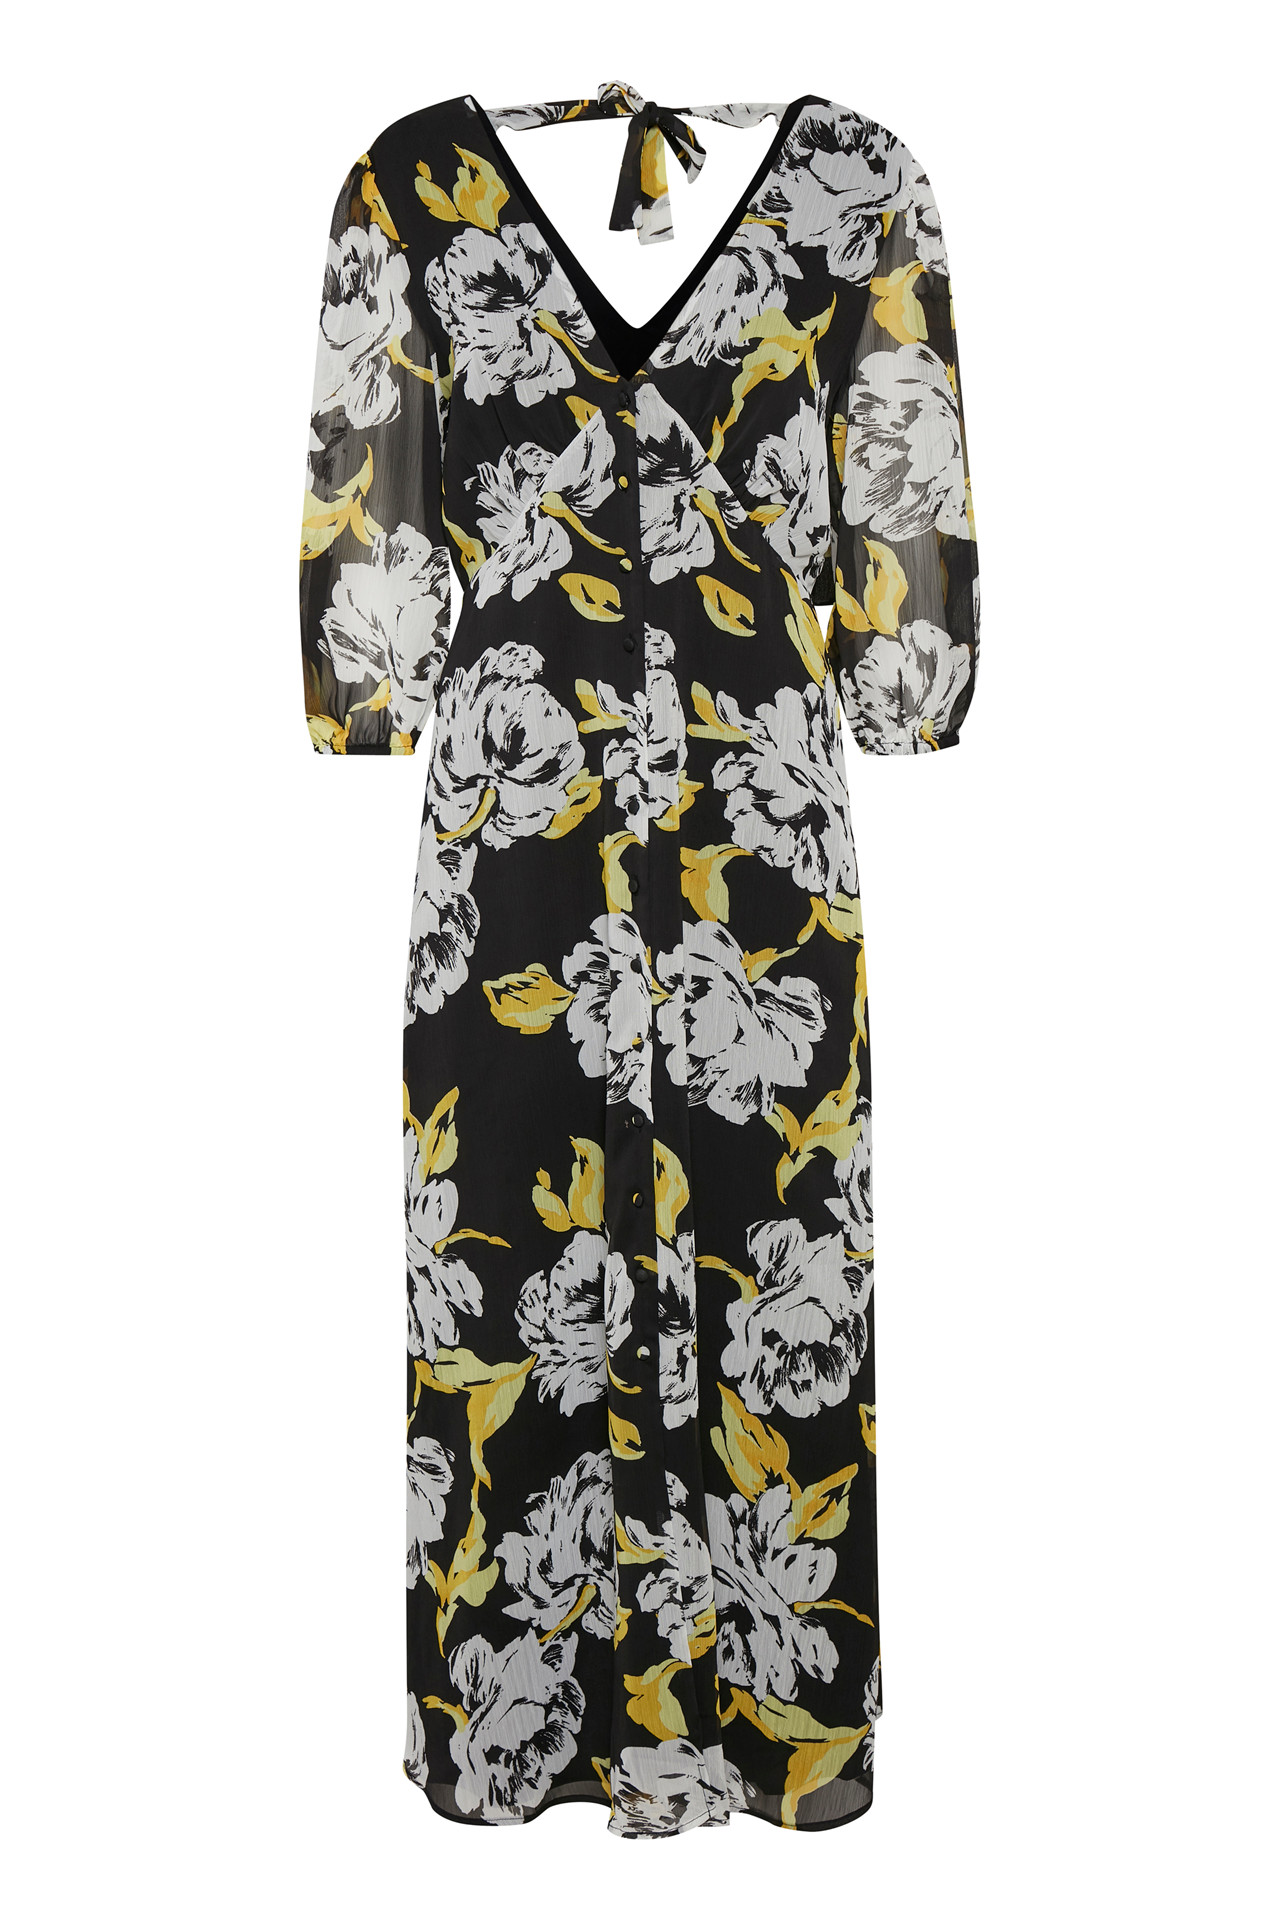 GESTUZ TESSGZ LANG KJOLE 10904248 (Yellow/Black Flower 90692, 36)